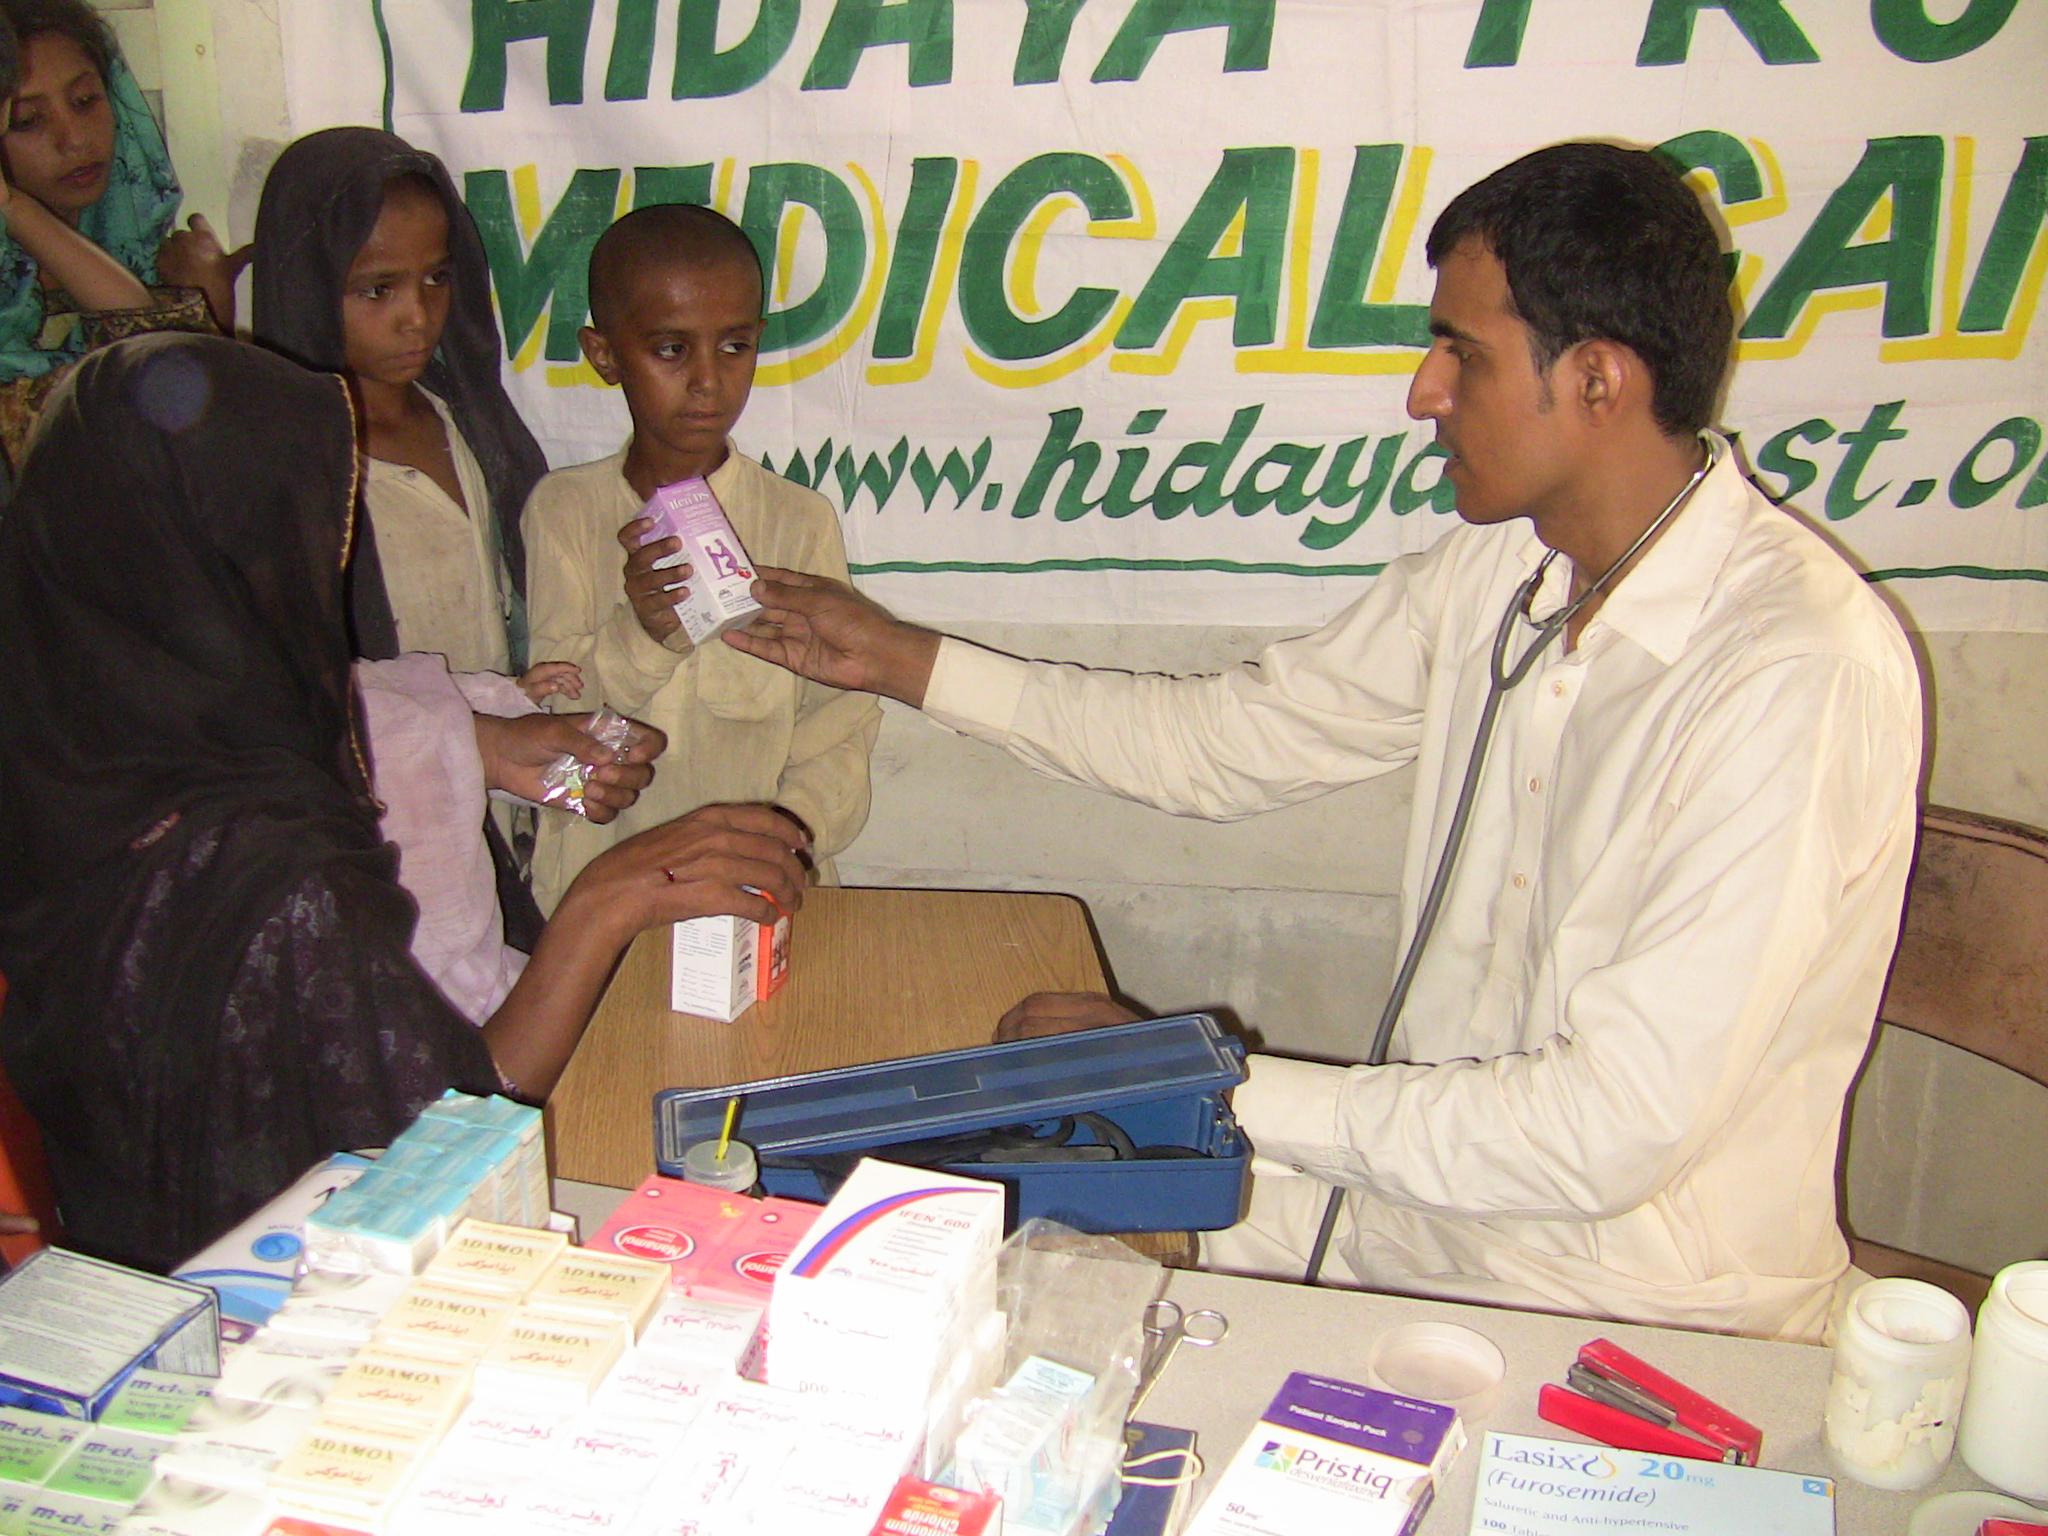 20110716_Sldo_Hcp_Aaqureshi_Bdsanjrani_Sind_Shp_Villrahimabad_Balochform_Medicalcamp_46